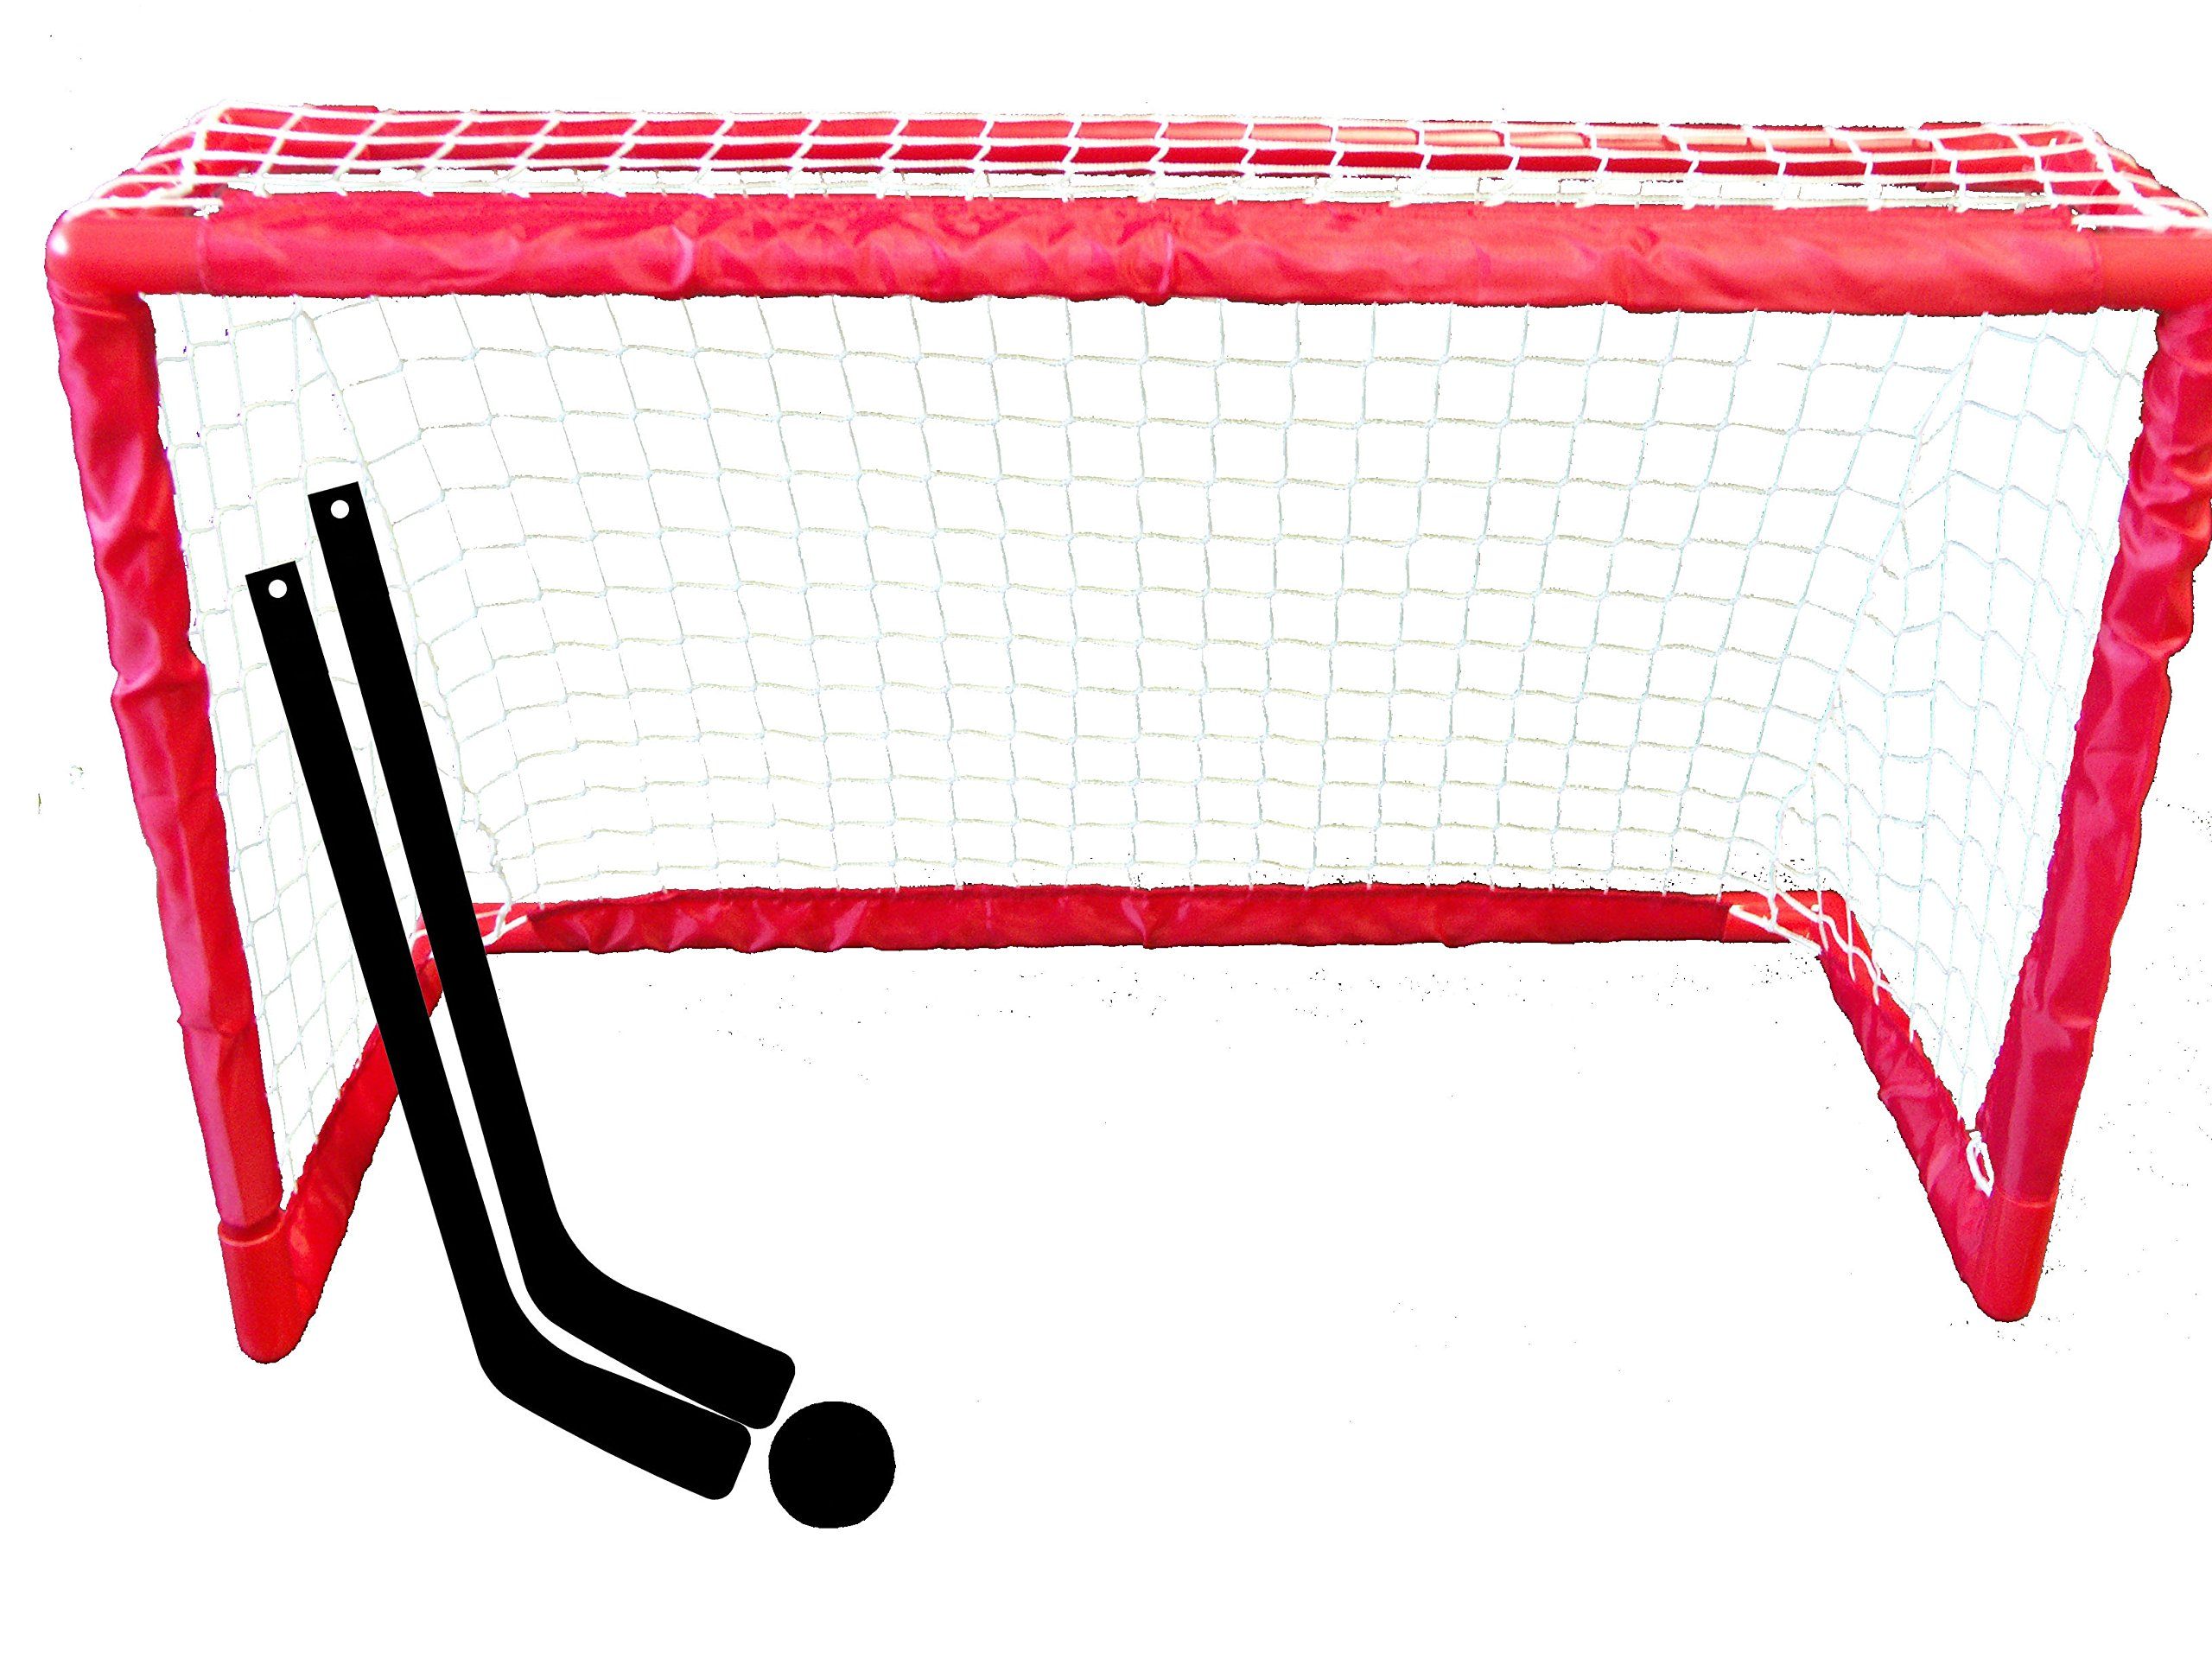 Proguard Mini Goal Set by Pro Guard